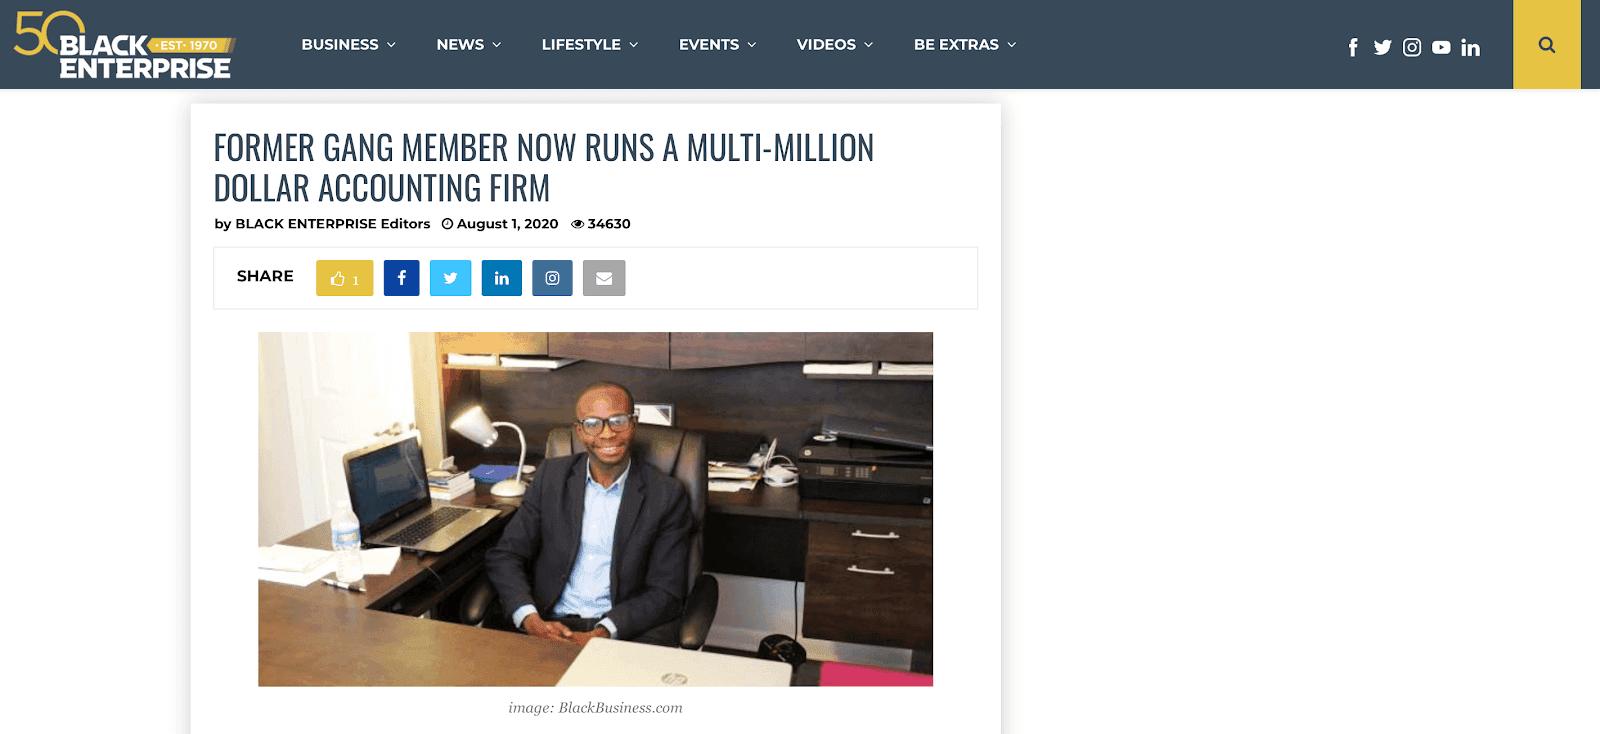 Black Enterprise headline